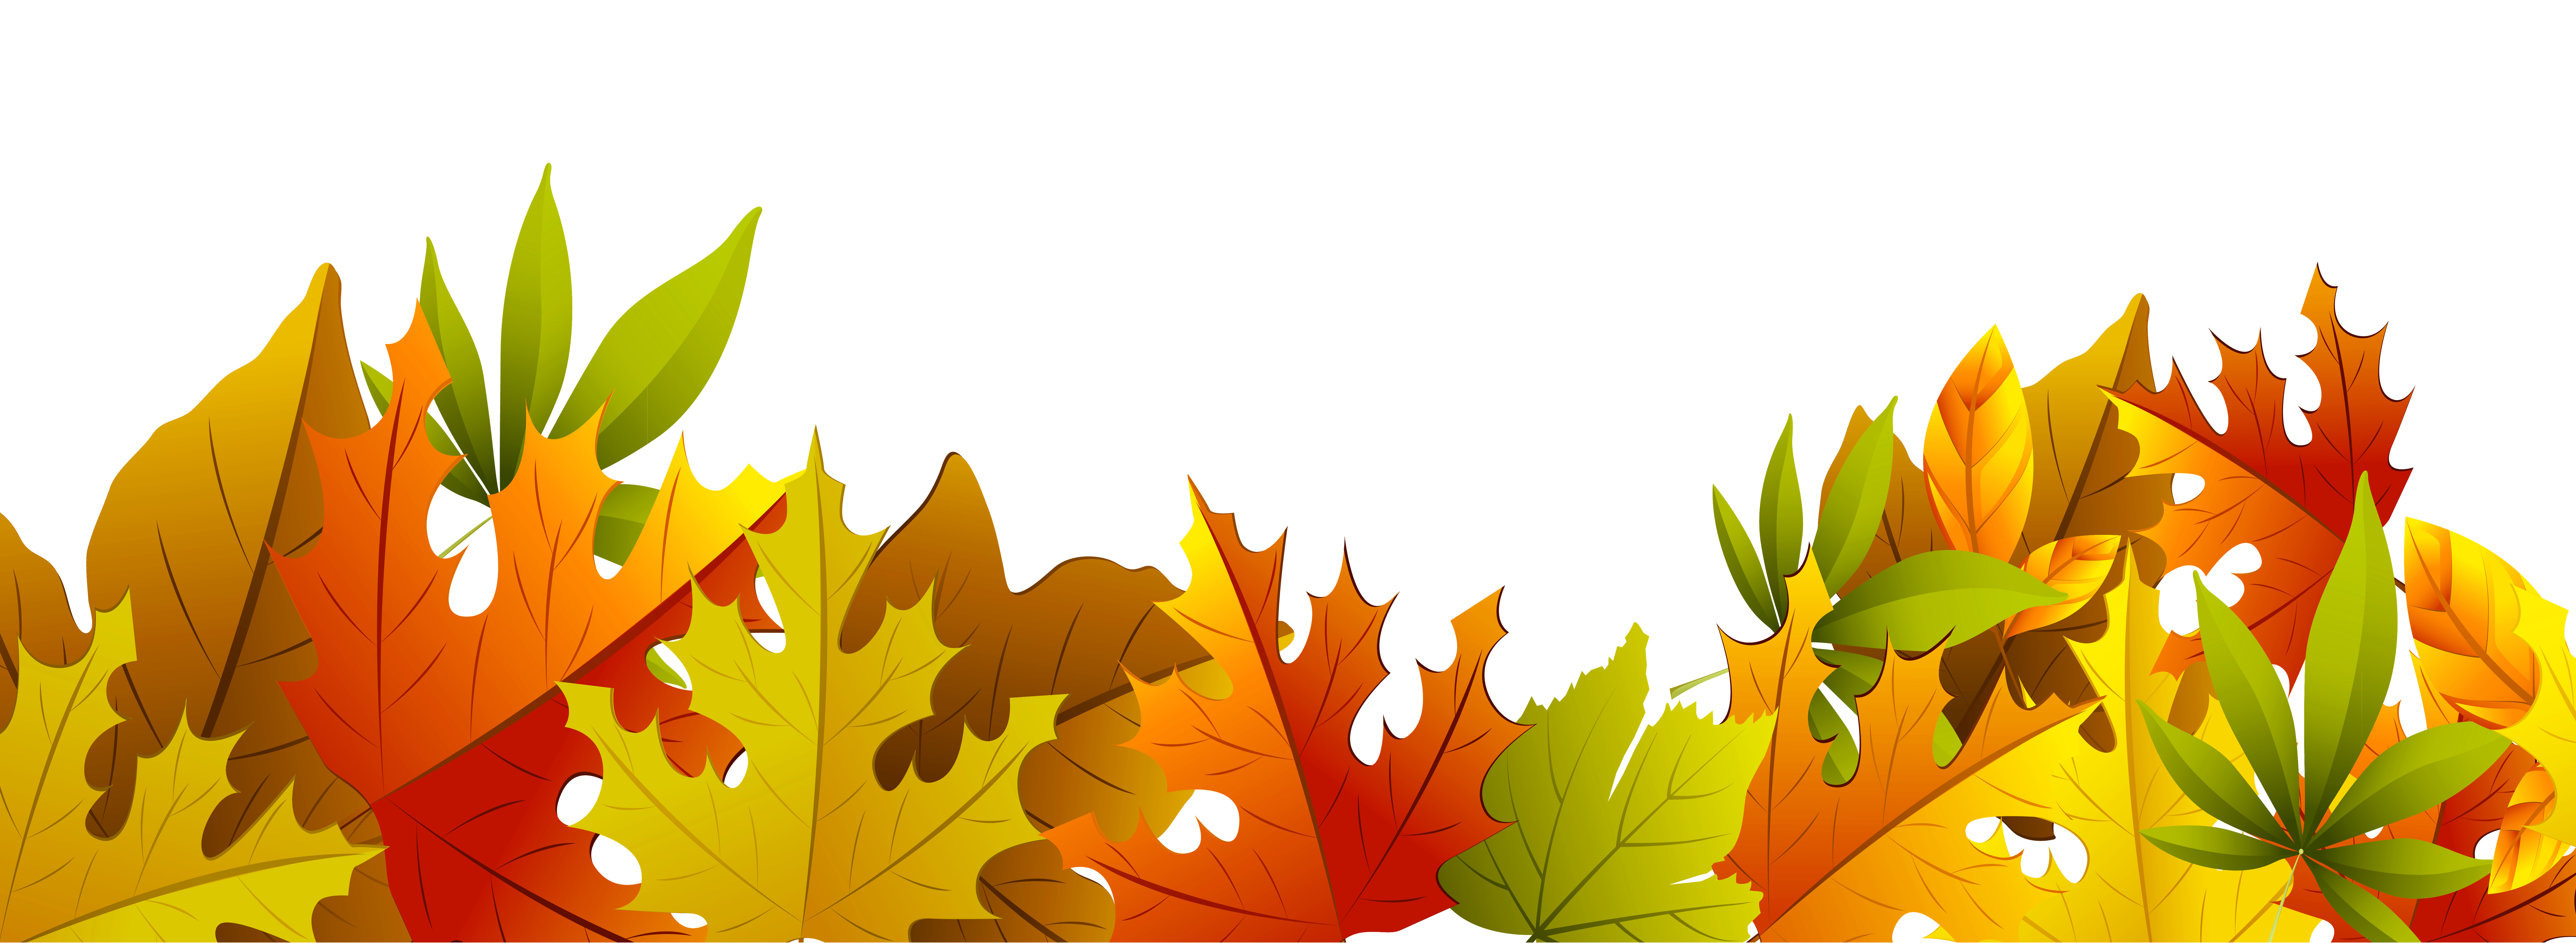 Decorative autumn leaves clipart-Decorative autumn leaves clipart-15